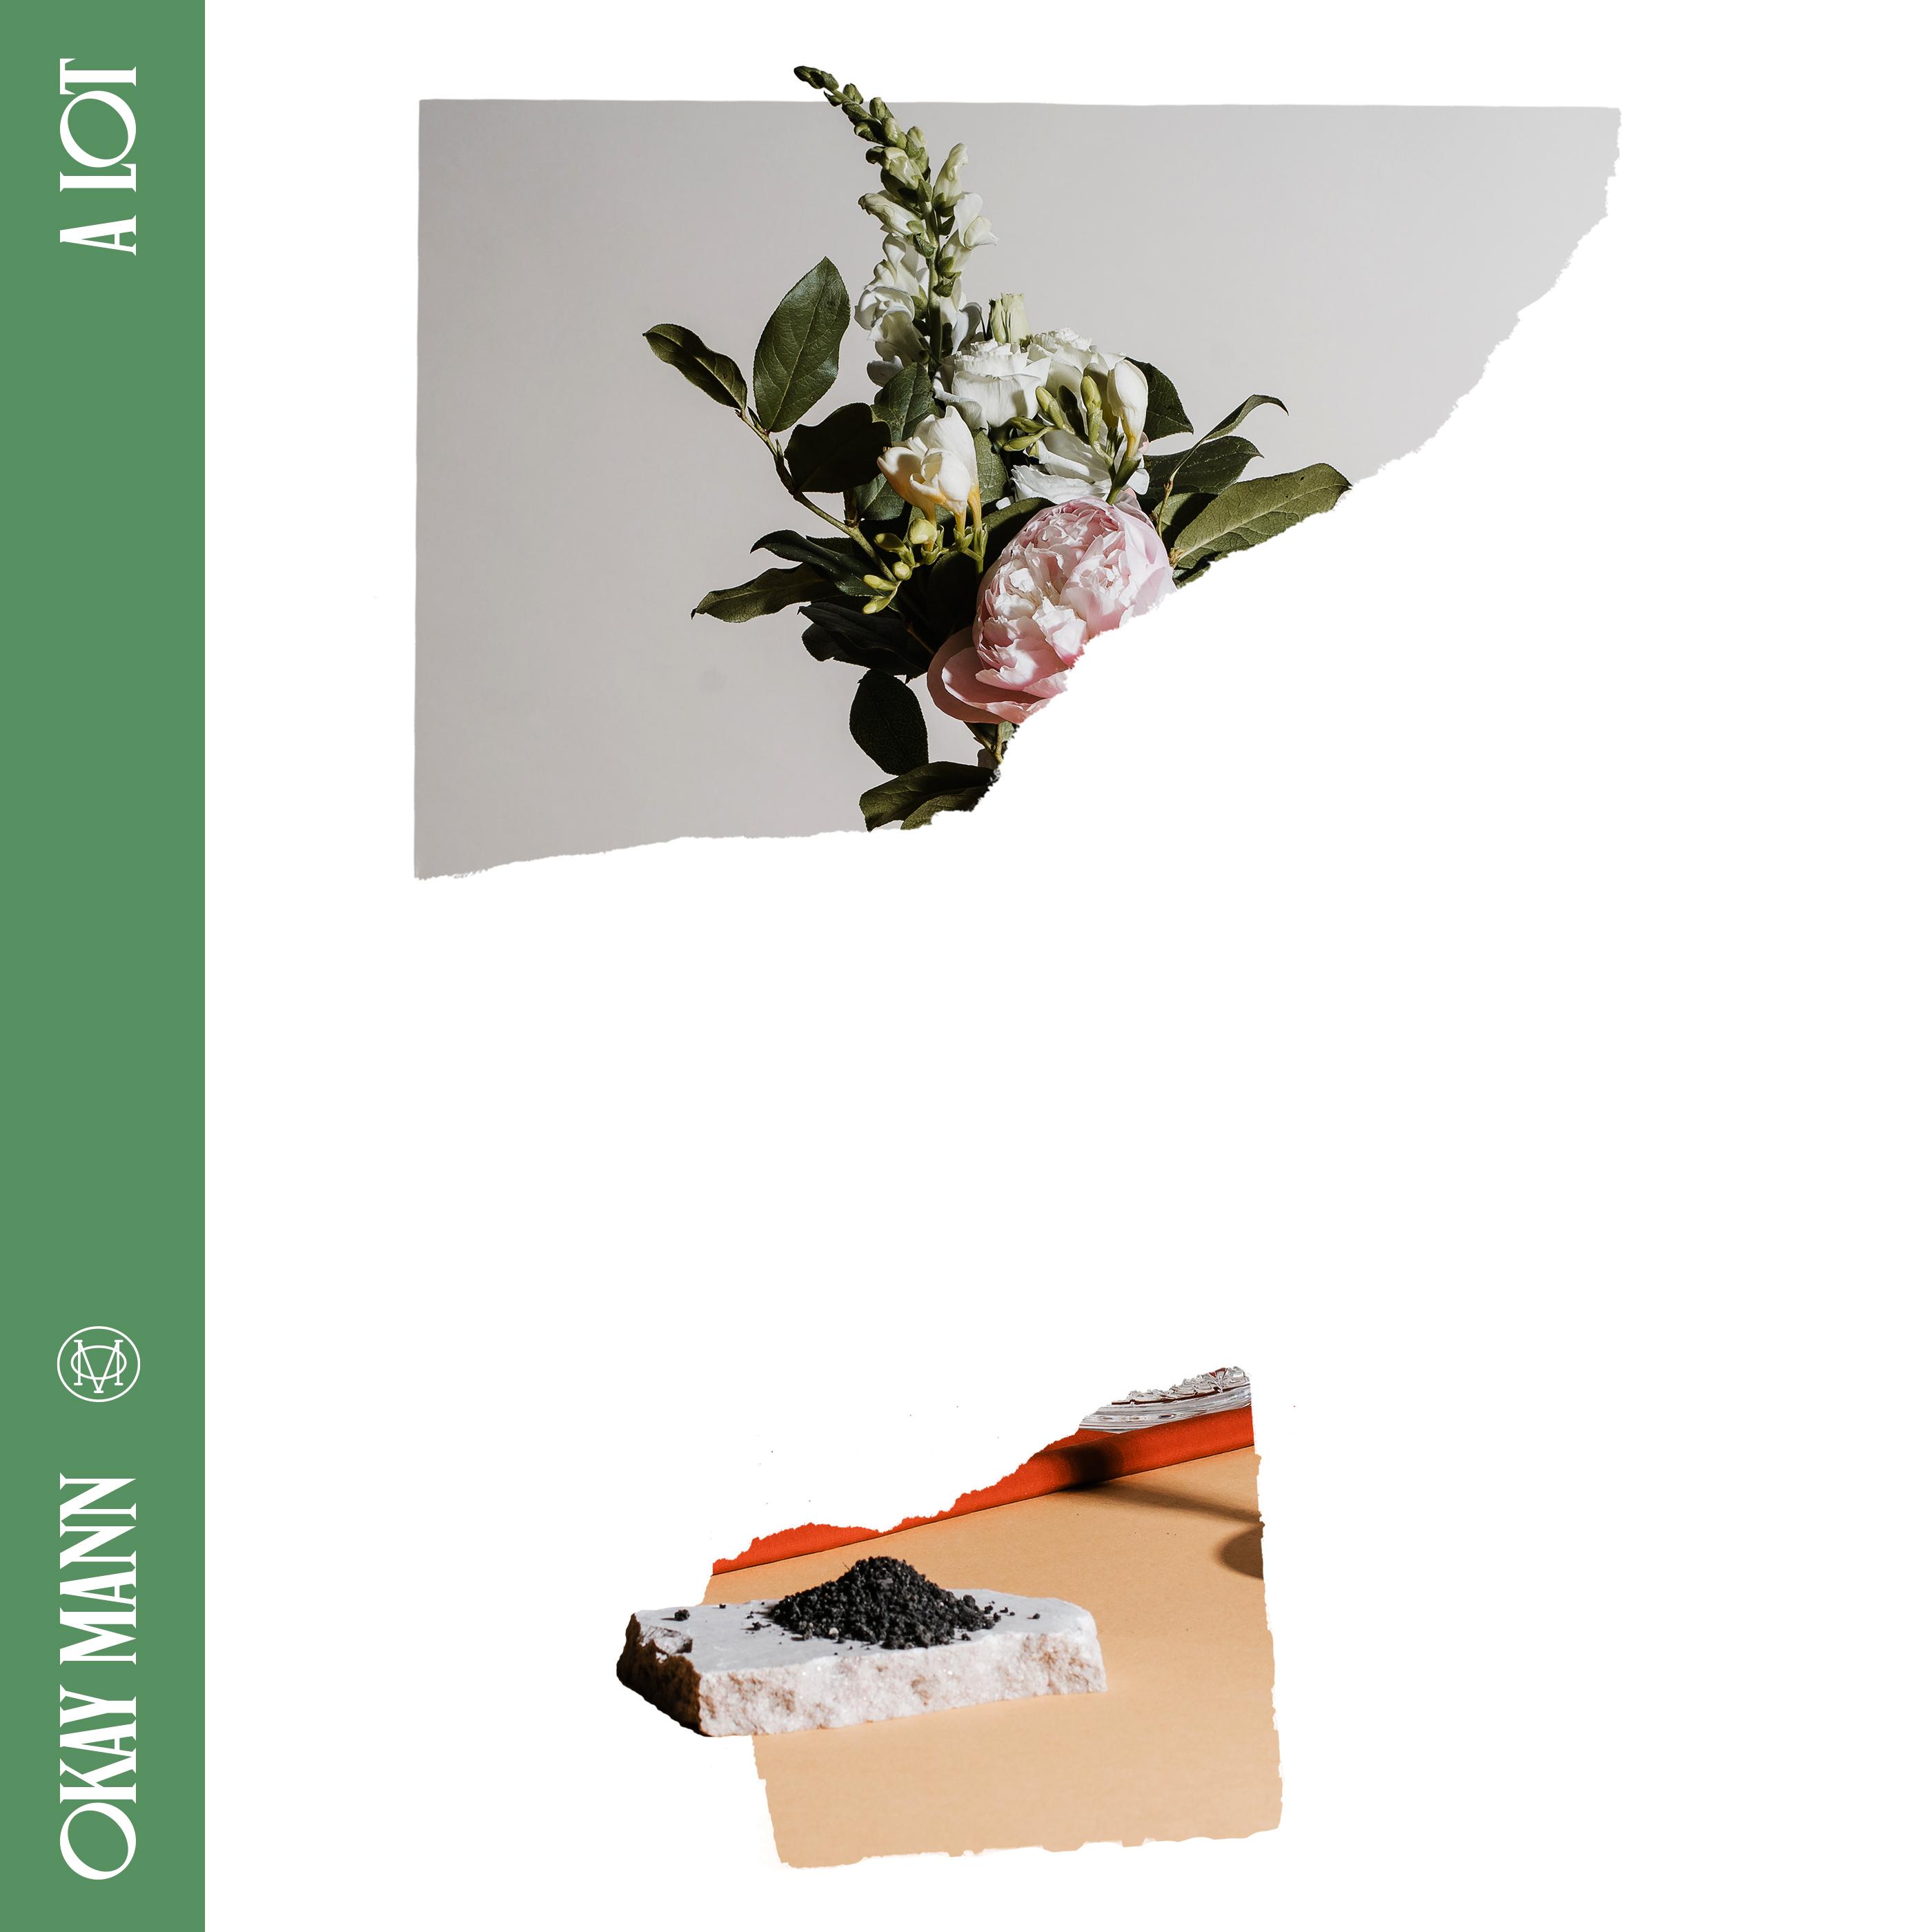 A Lot album cover